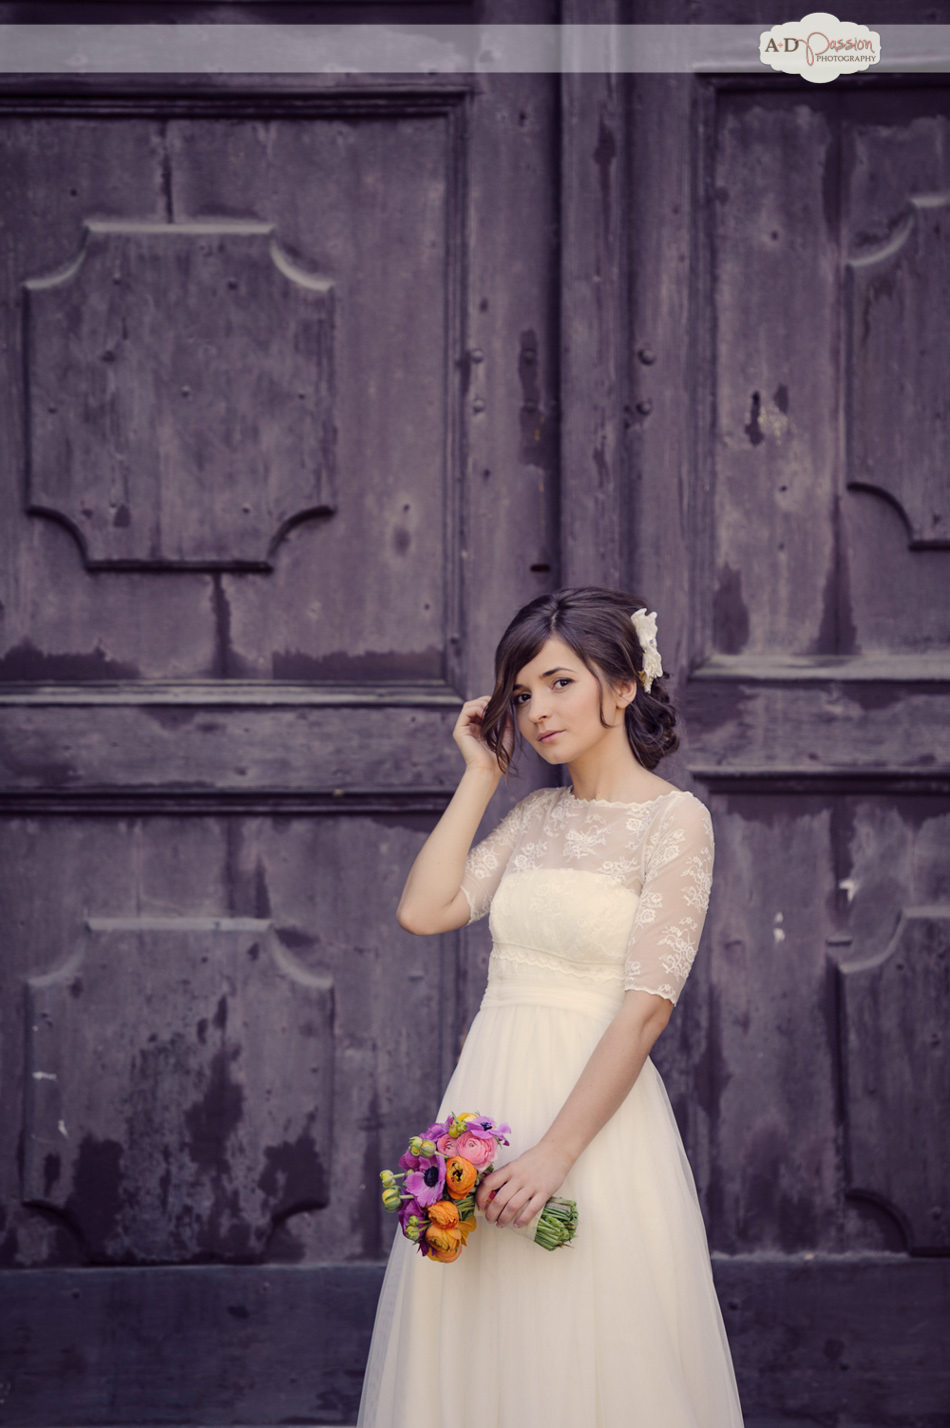 AD Passion Photography | 20130529_fotograf-nunta_elisa_si_marius_0074 | Adelin, Dida, fotograf profesionist, fotograf de nunta, fotografie de nunta, fotograf Timisoara, fotograf Craiova, fotograf Bucuresti, fotograf Arad, nunta Timisoara, nunta Arad, nunta Bucuresti, nunta Craiova